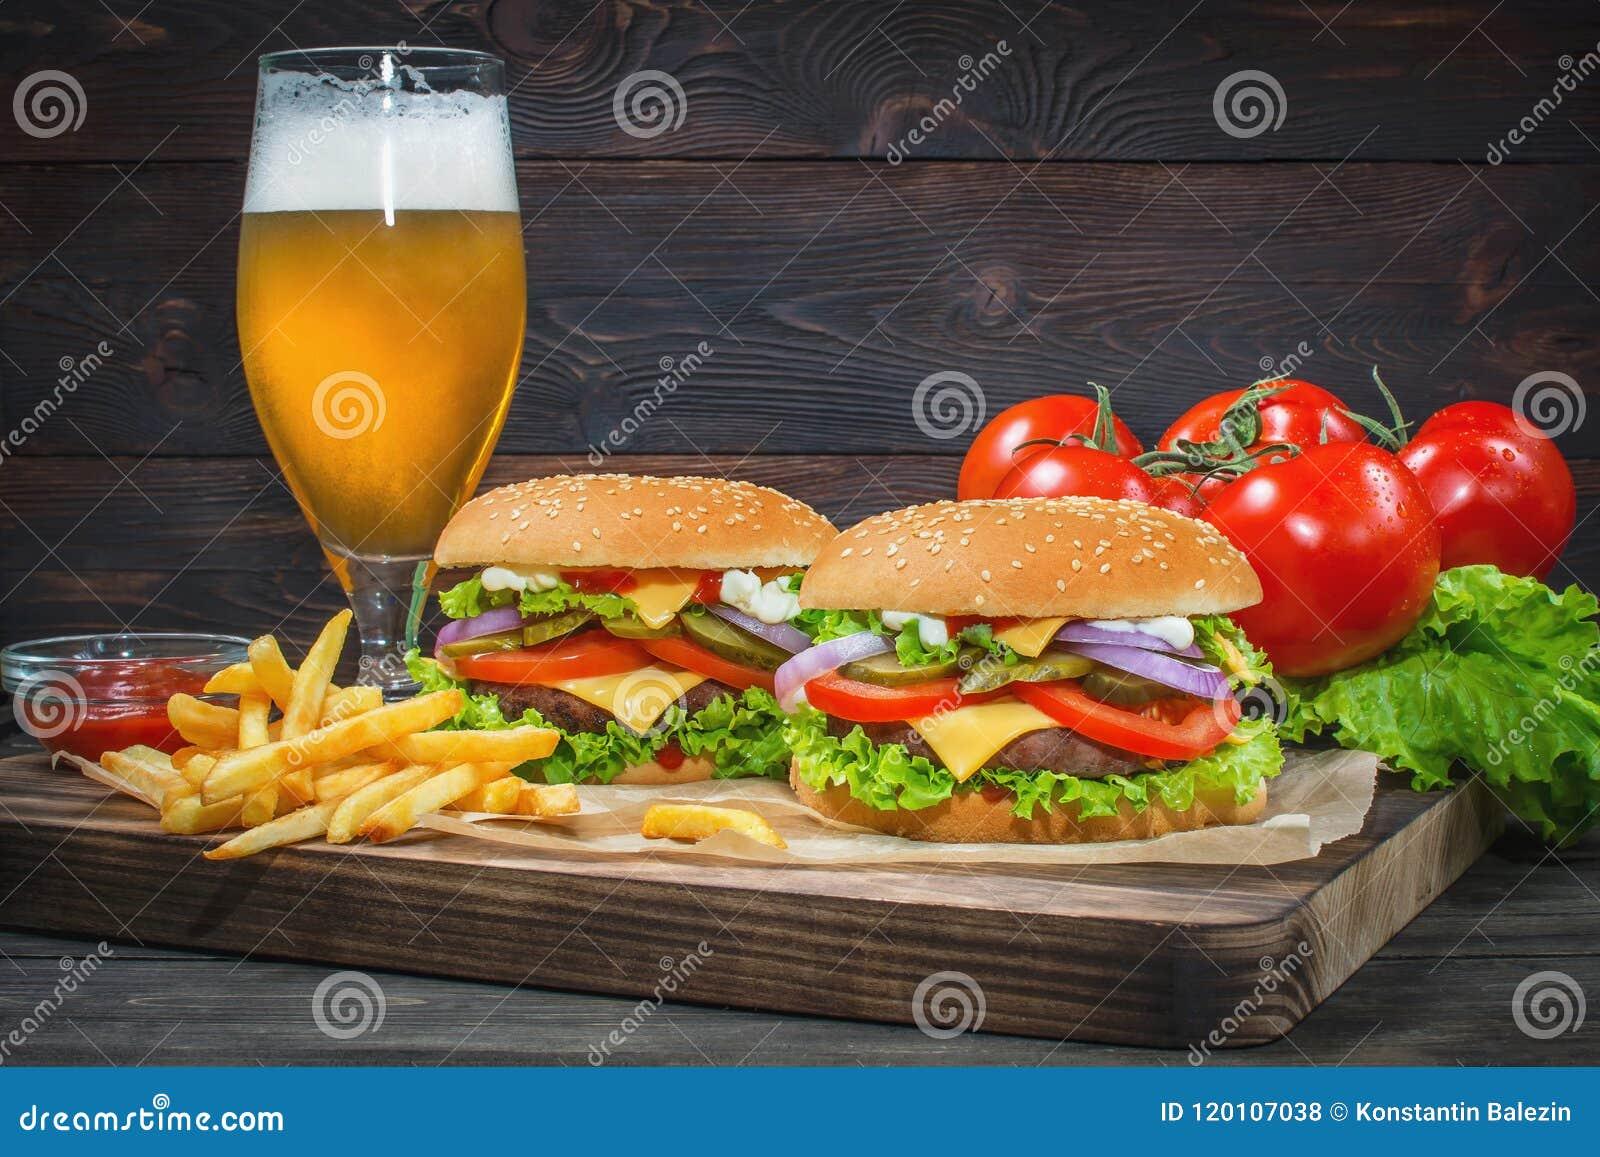 Hamburger en licht bier op een barachtergrond